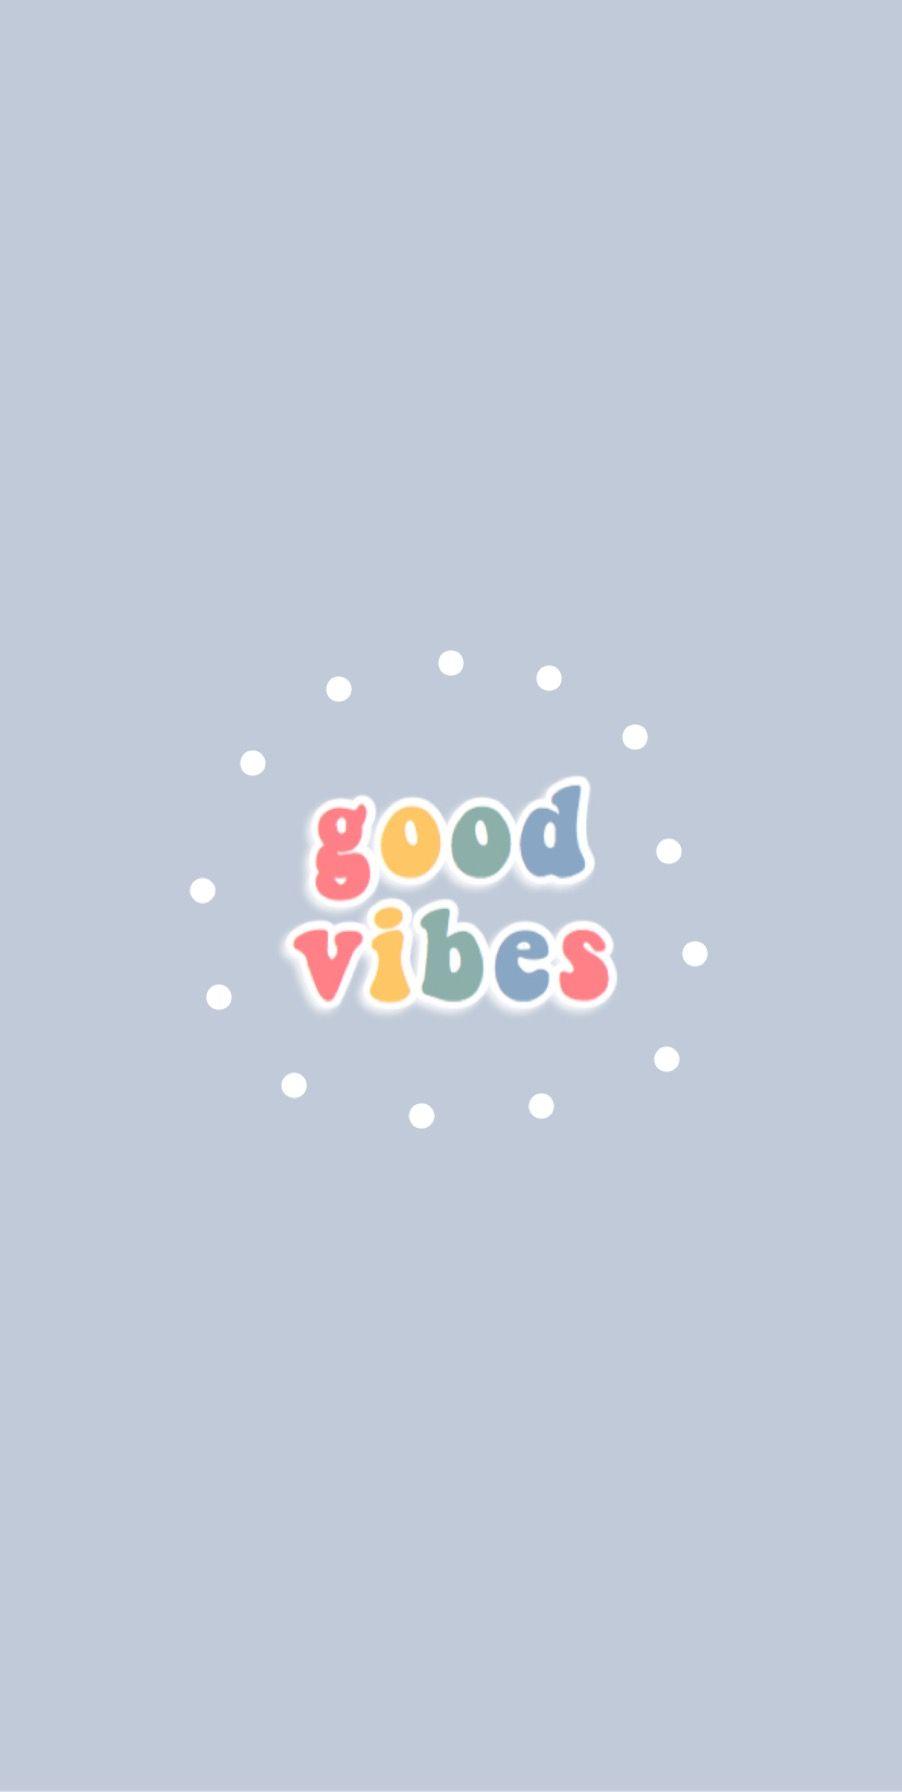 Good Vibes Background Cute Screen Savers Iphone Wallpaper Images Iphone Background Wallpaper